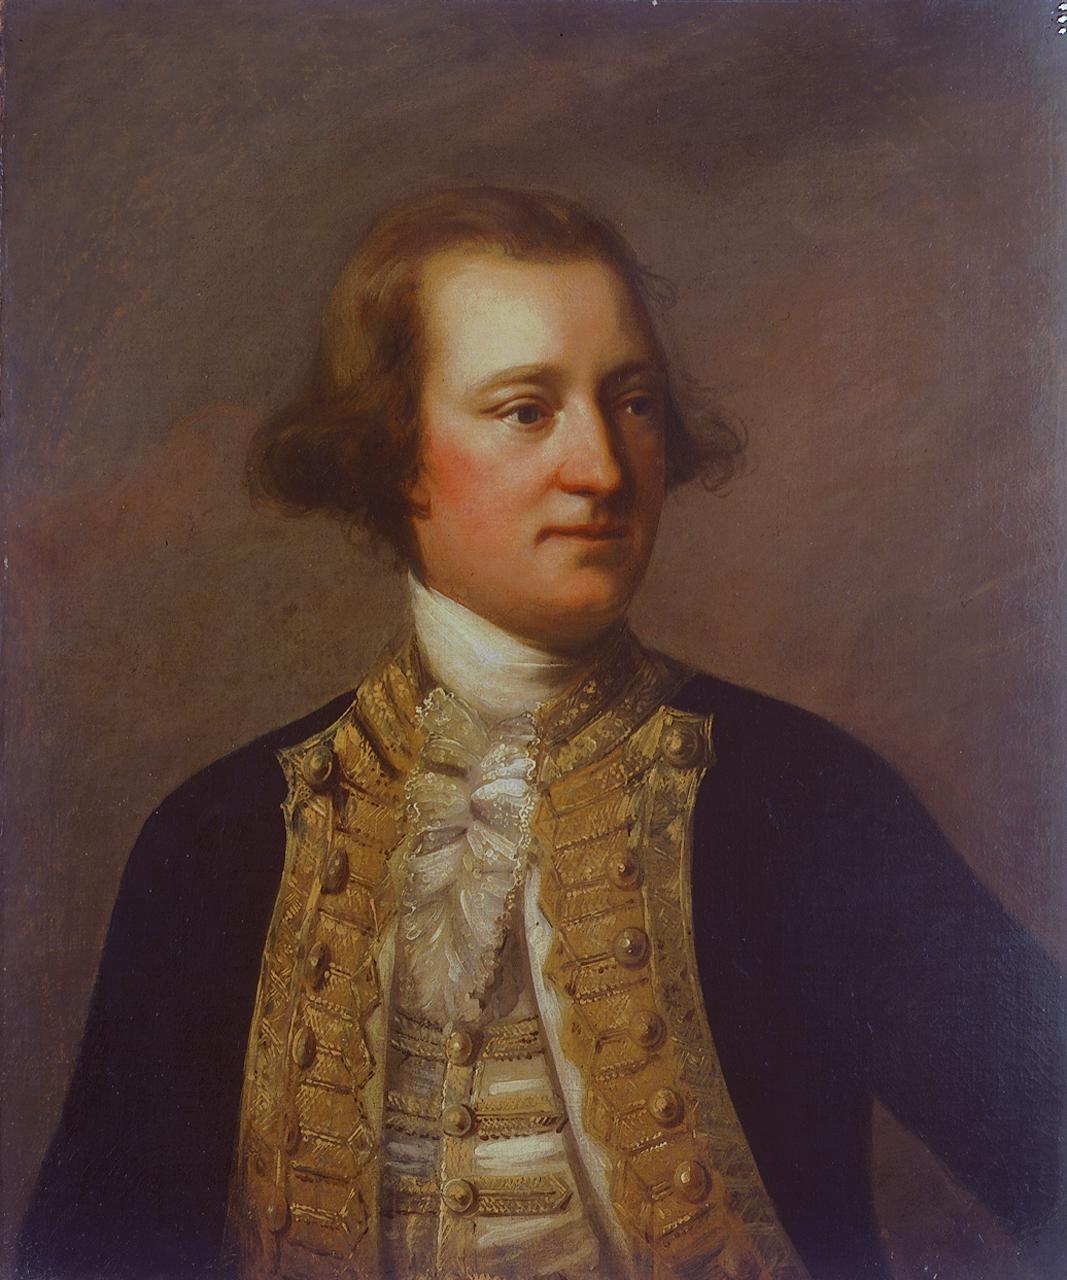 Admiral Lord George Brydges Rodney (1719-1792), 1st Baron Rodney